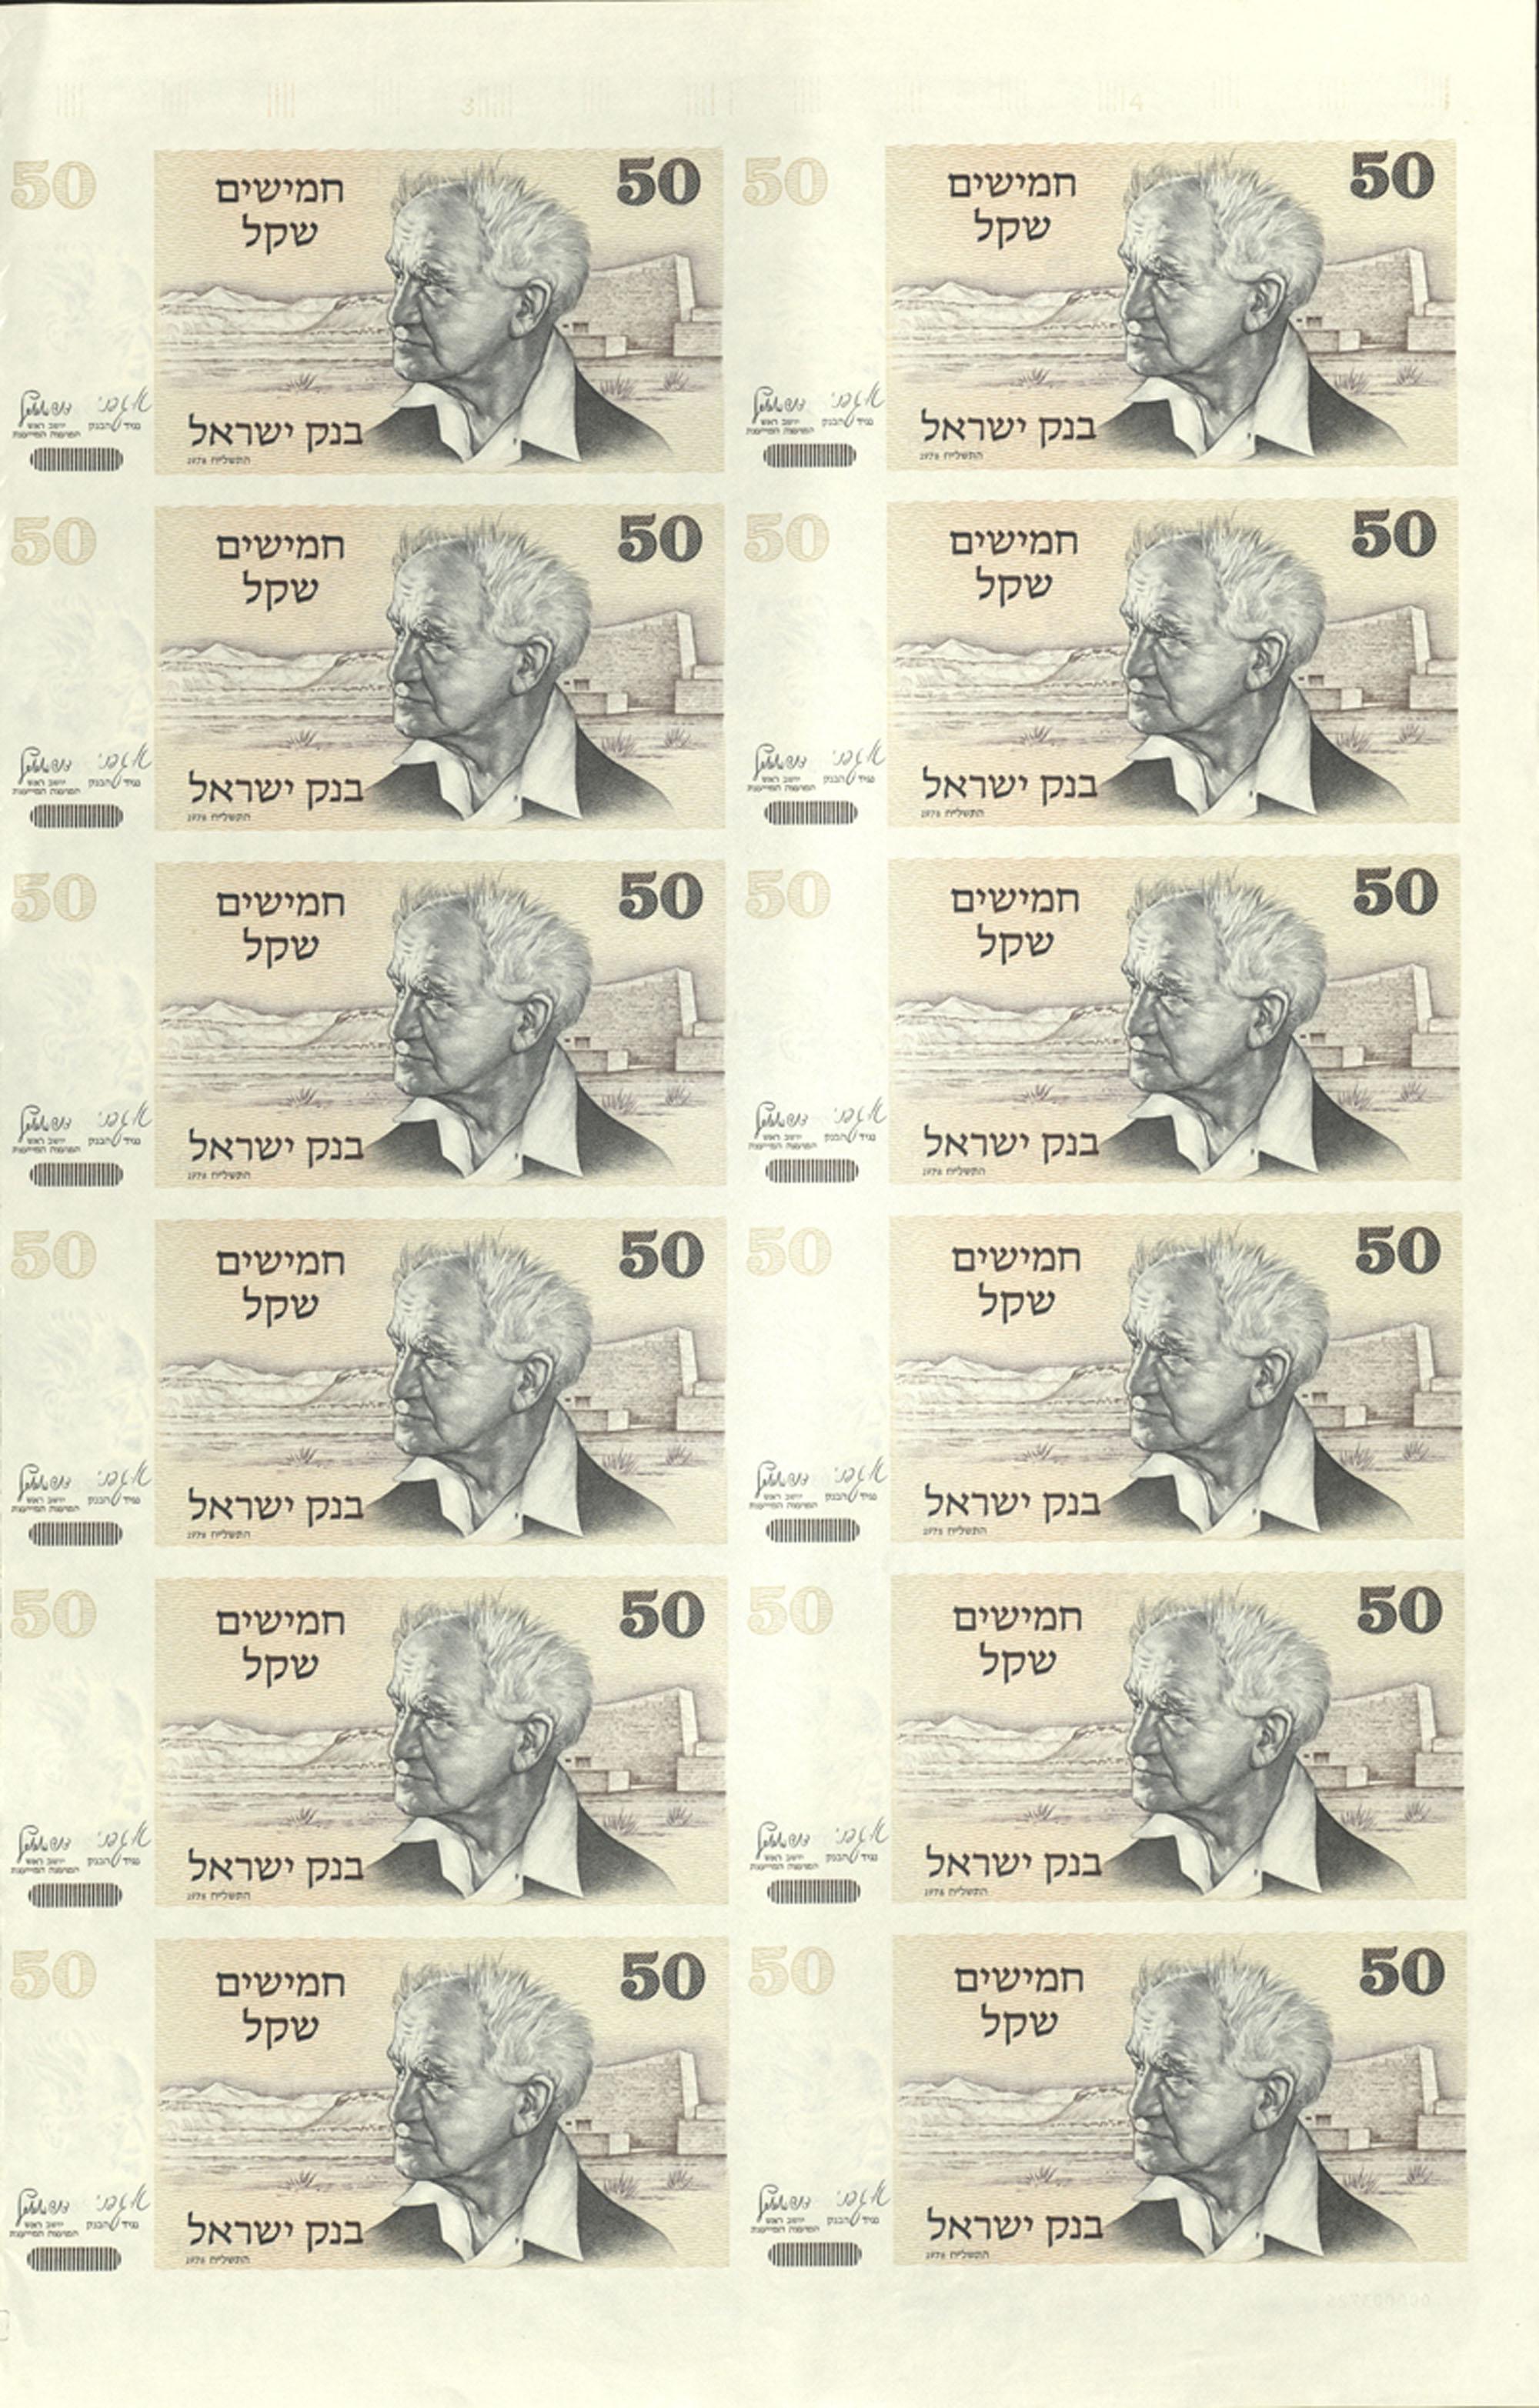 [50 shekel banknote]